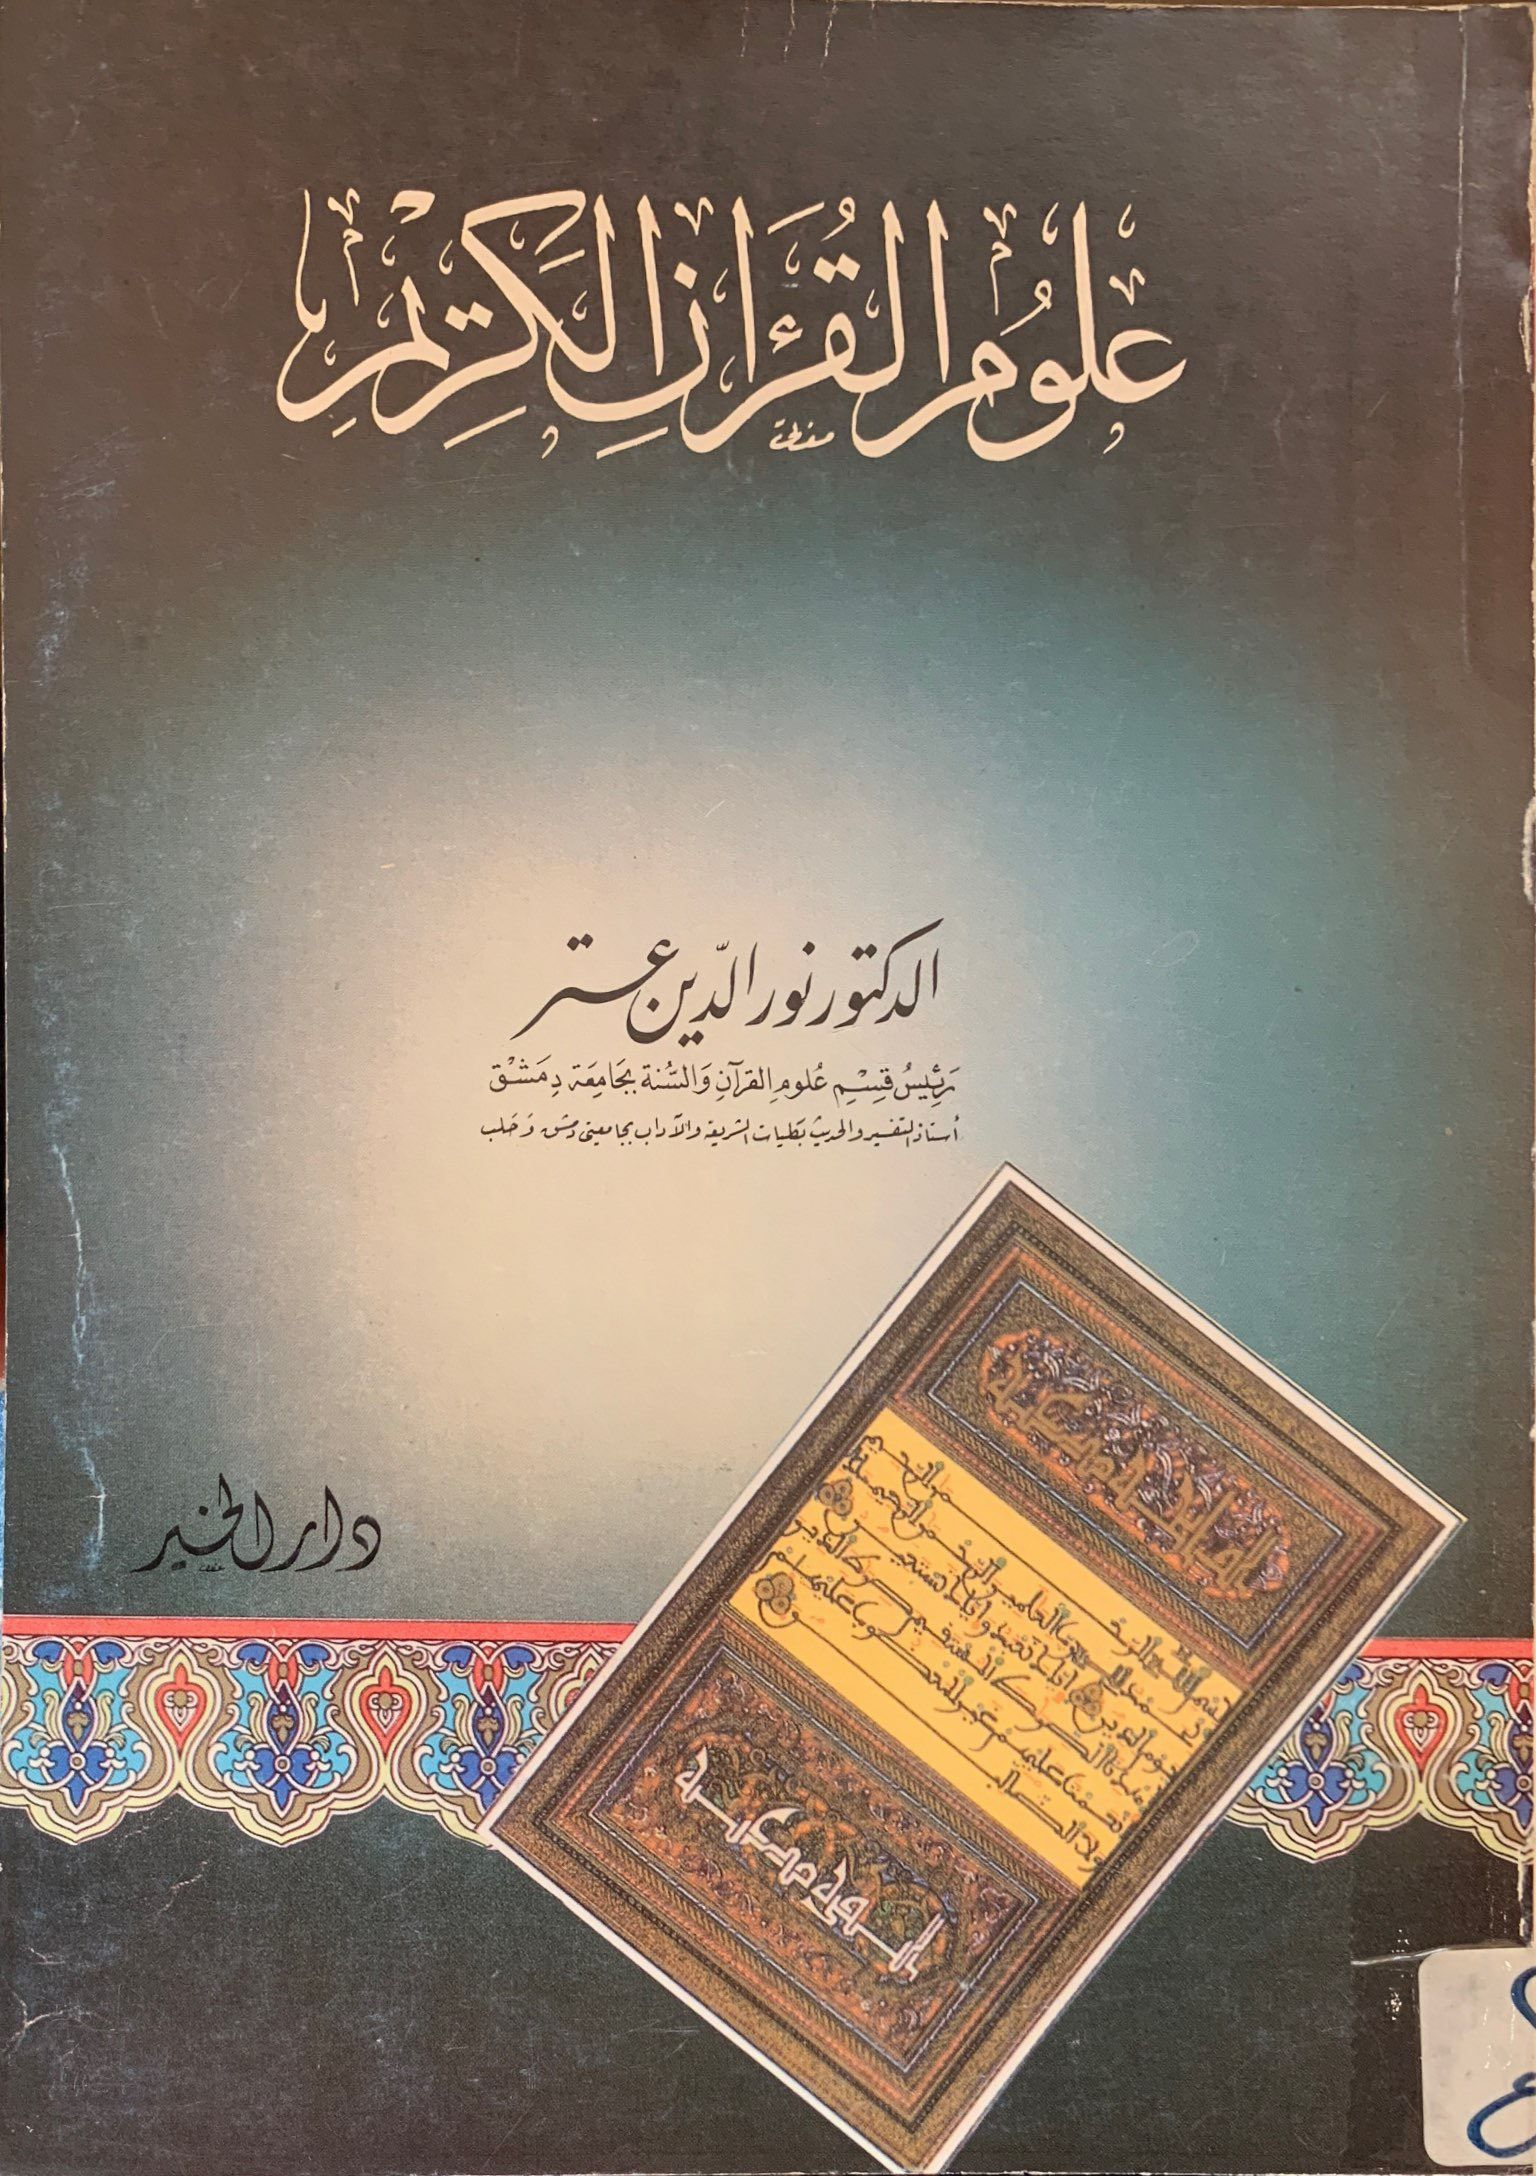 علوم القرآن نور الدين عتر Pdf Book Cover Books Cover